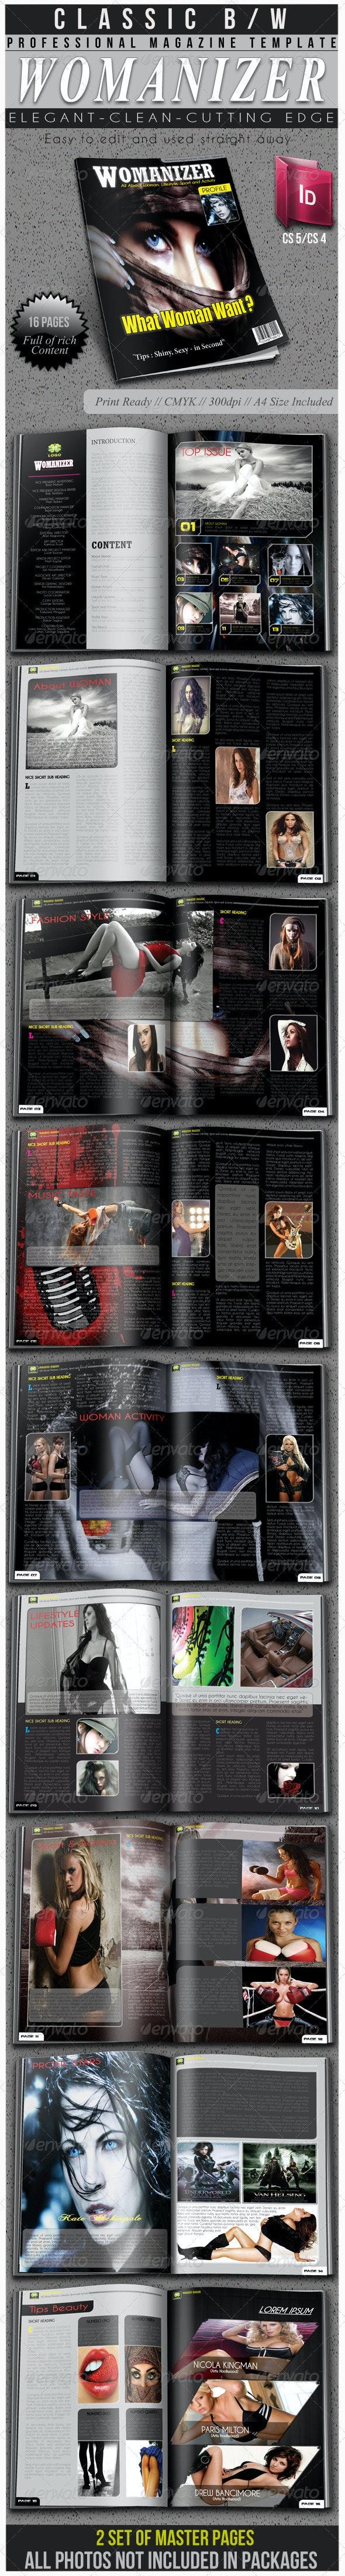 Womanizer Professional Magazine Template - Magazines Print Templates